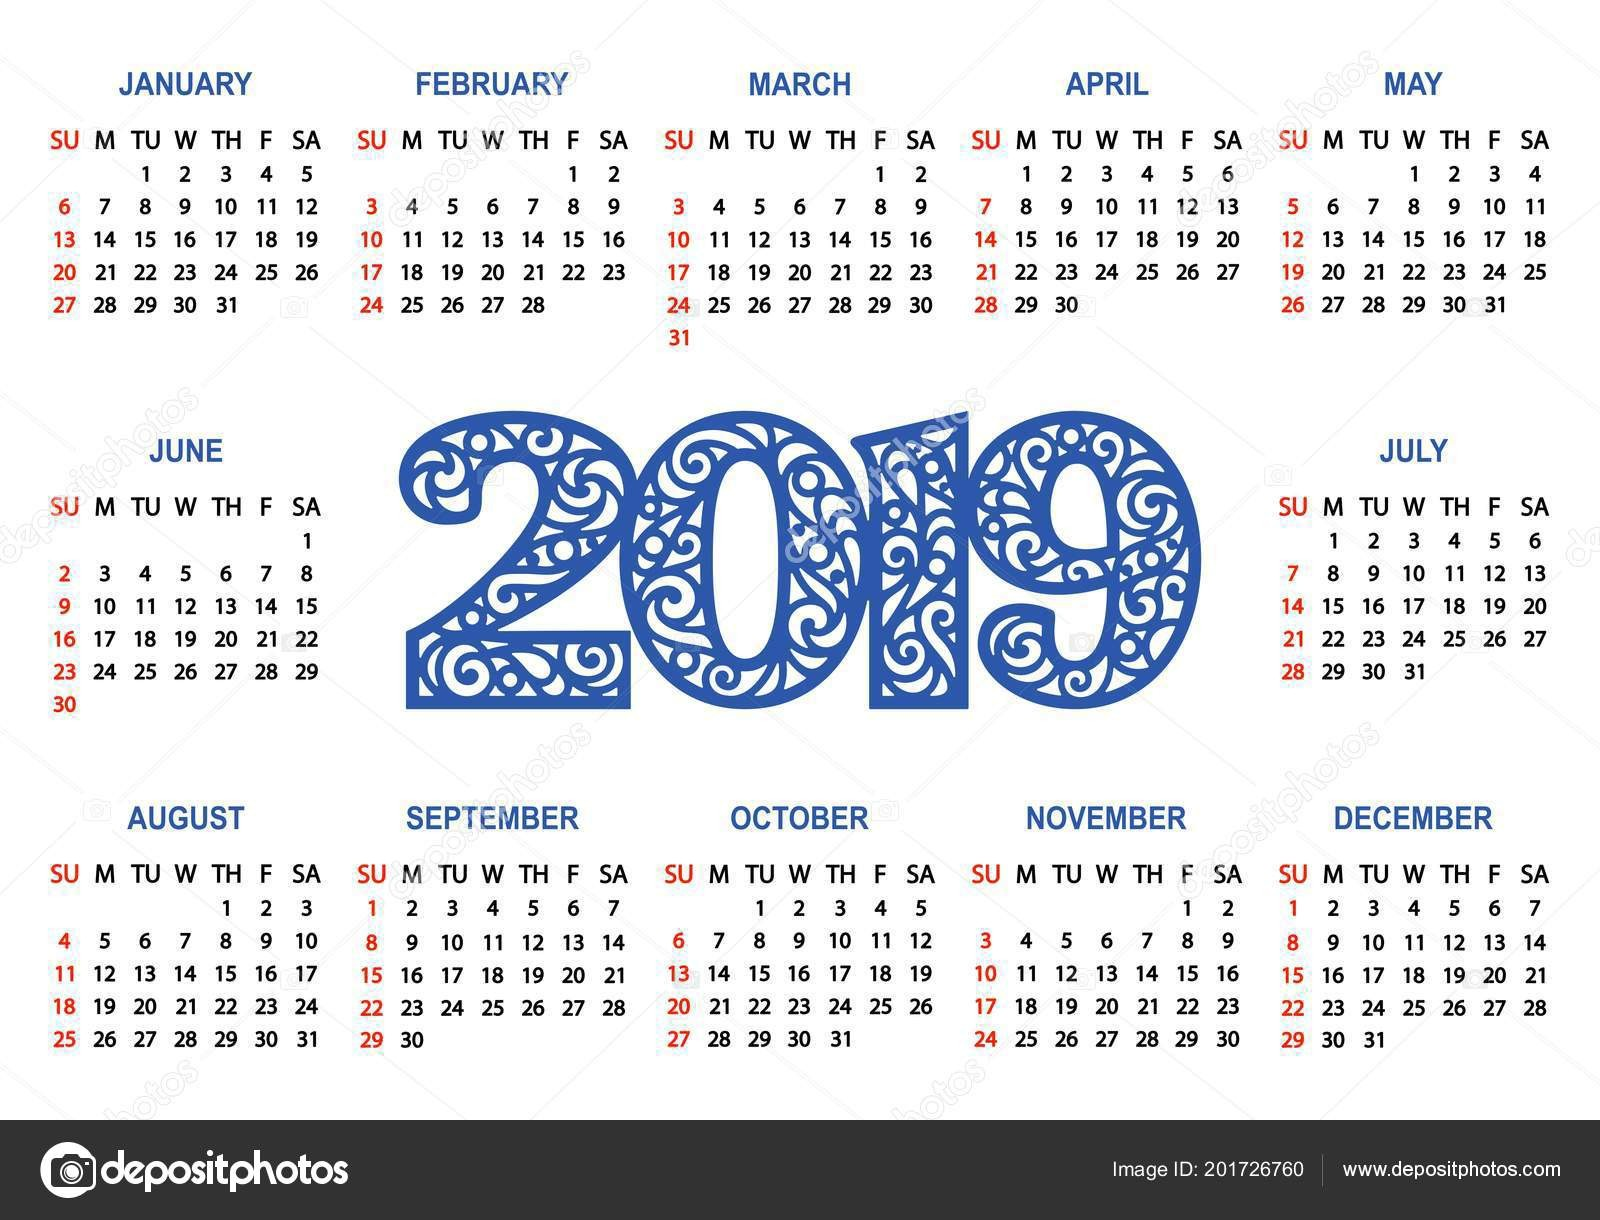 Calendario 2019 Imprimir Festivos Recientes Kalendář 2019 Blém Pozad T½den Začná Neděli Základn MřÅ¾ka Of Calendario 2019 Imprimir Festivos Más Recientes Medios Calendario 2016 Para Imprimir Con Feriados Chile